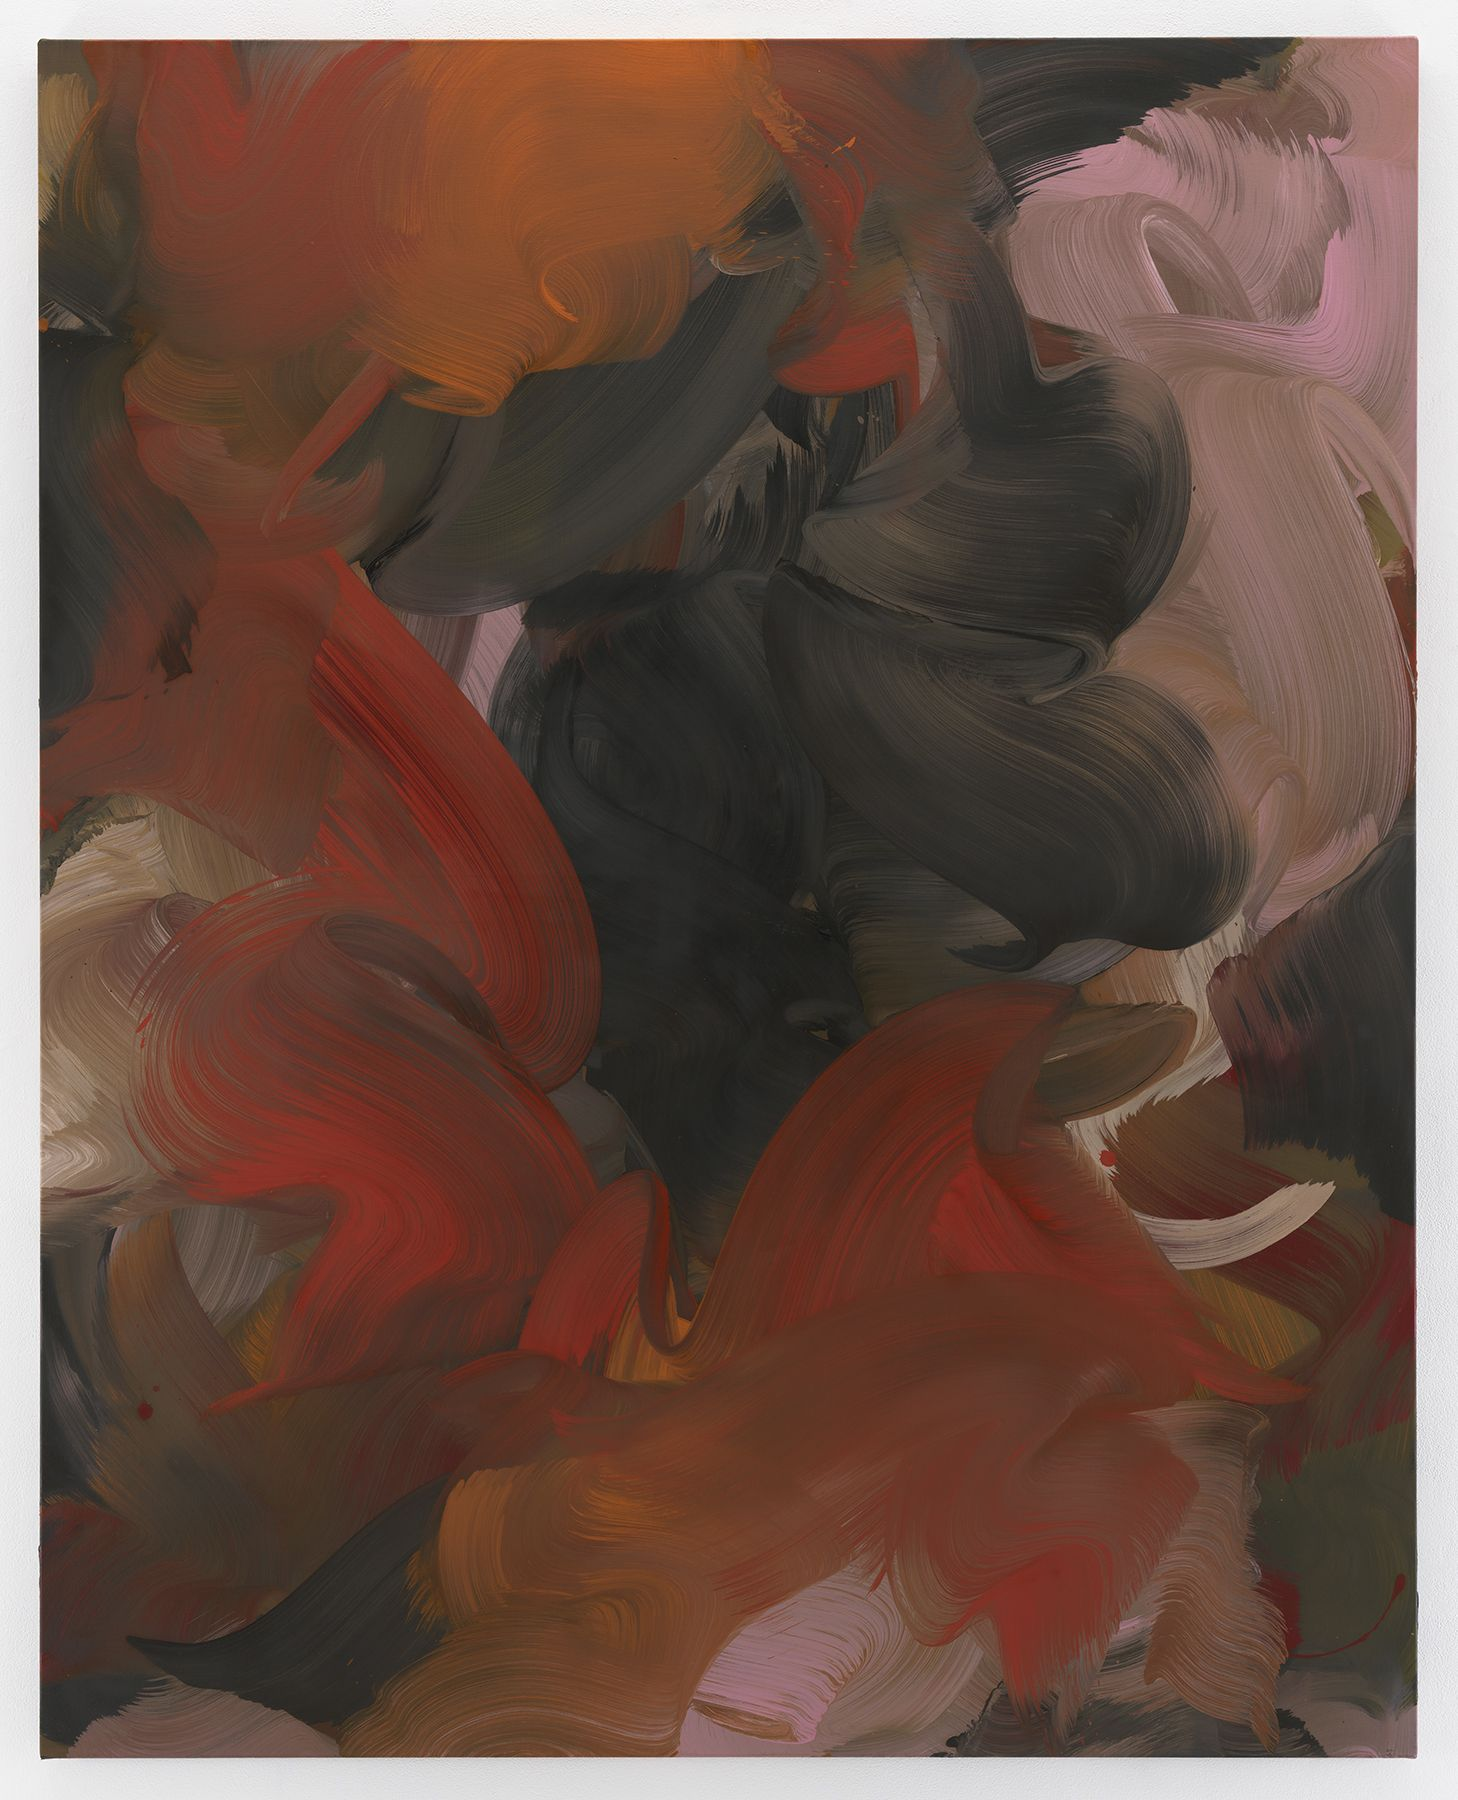 Fox's wedding, 2018,Oil on canvas,79 x 63 inches,200.7 x 160 cm,MMG#30269